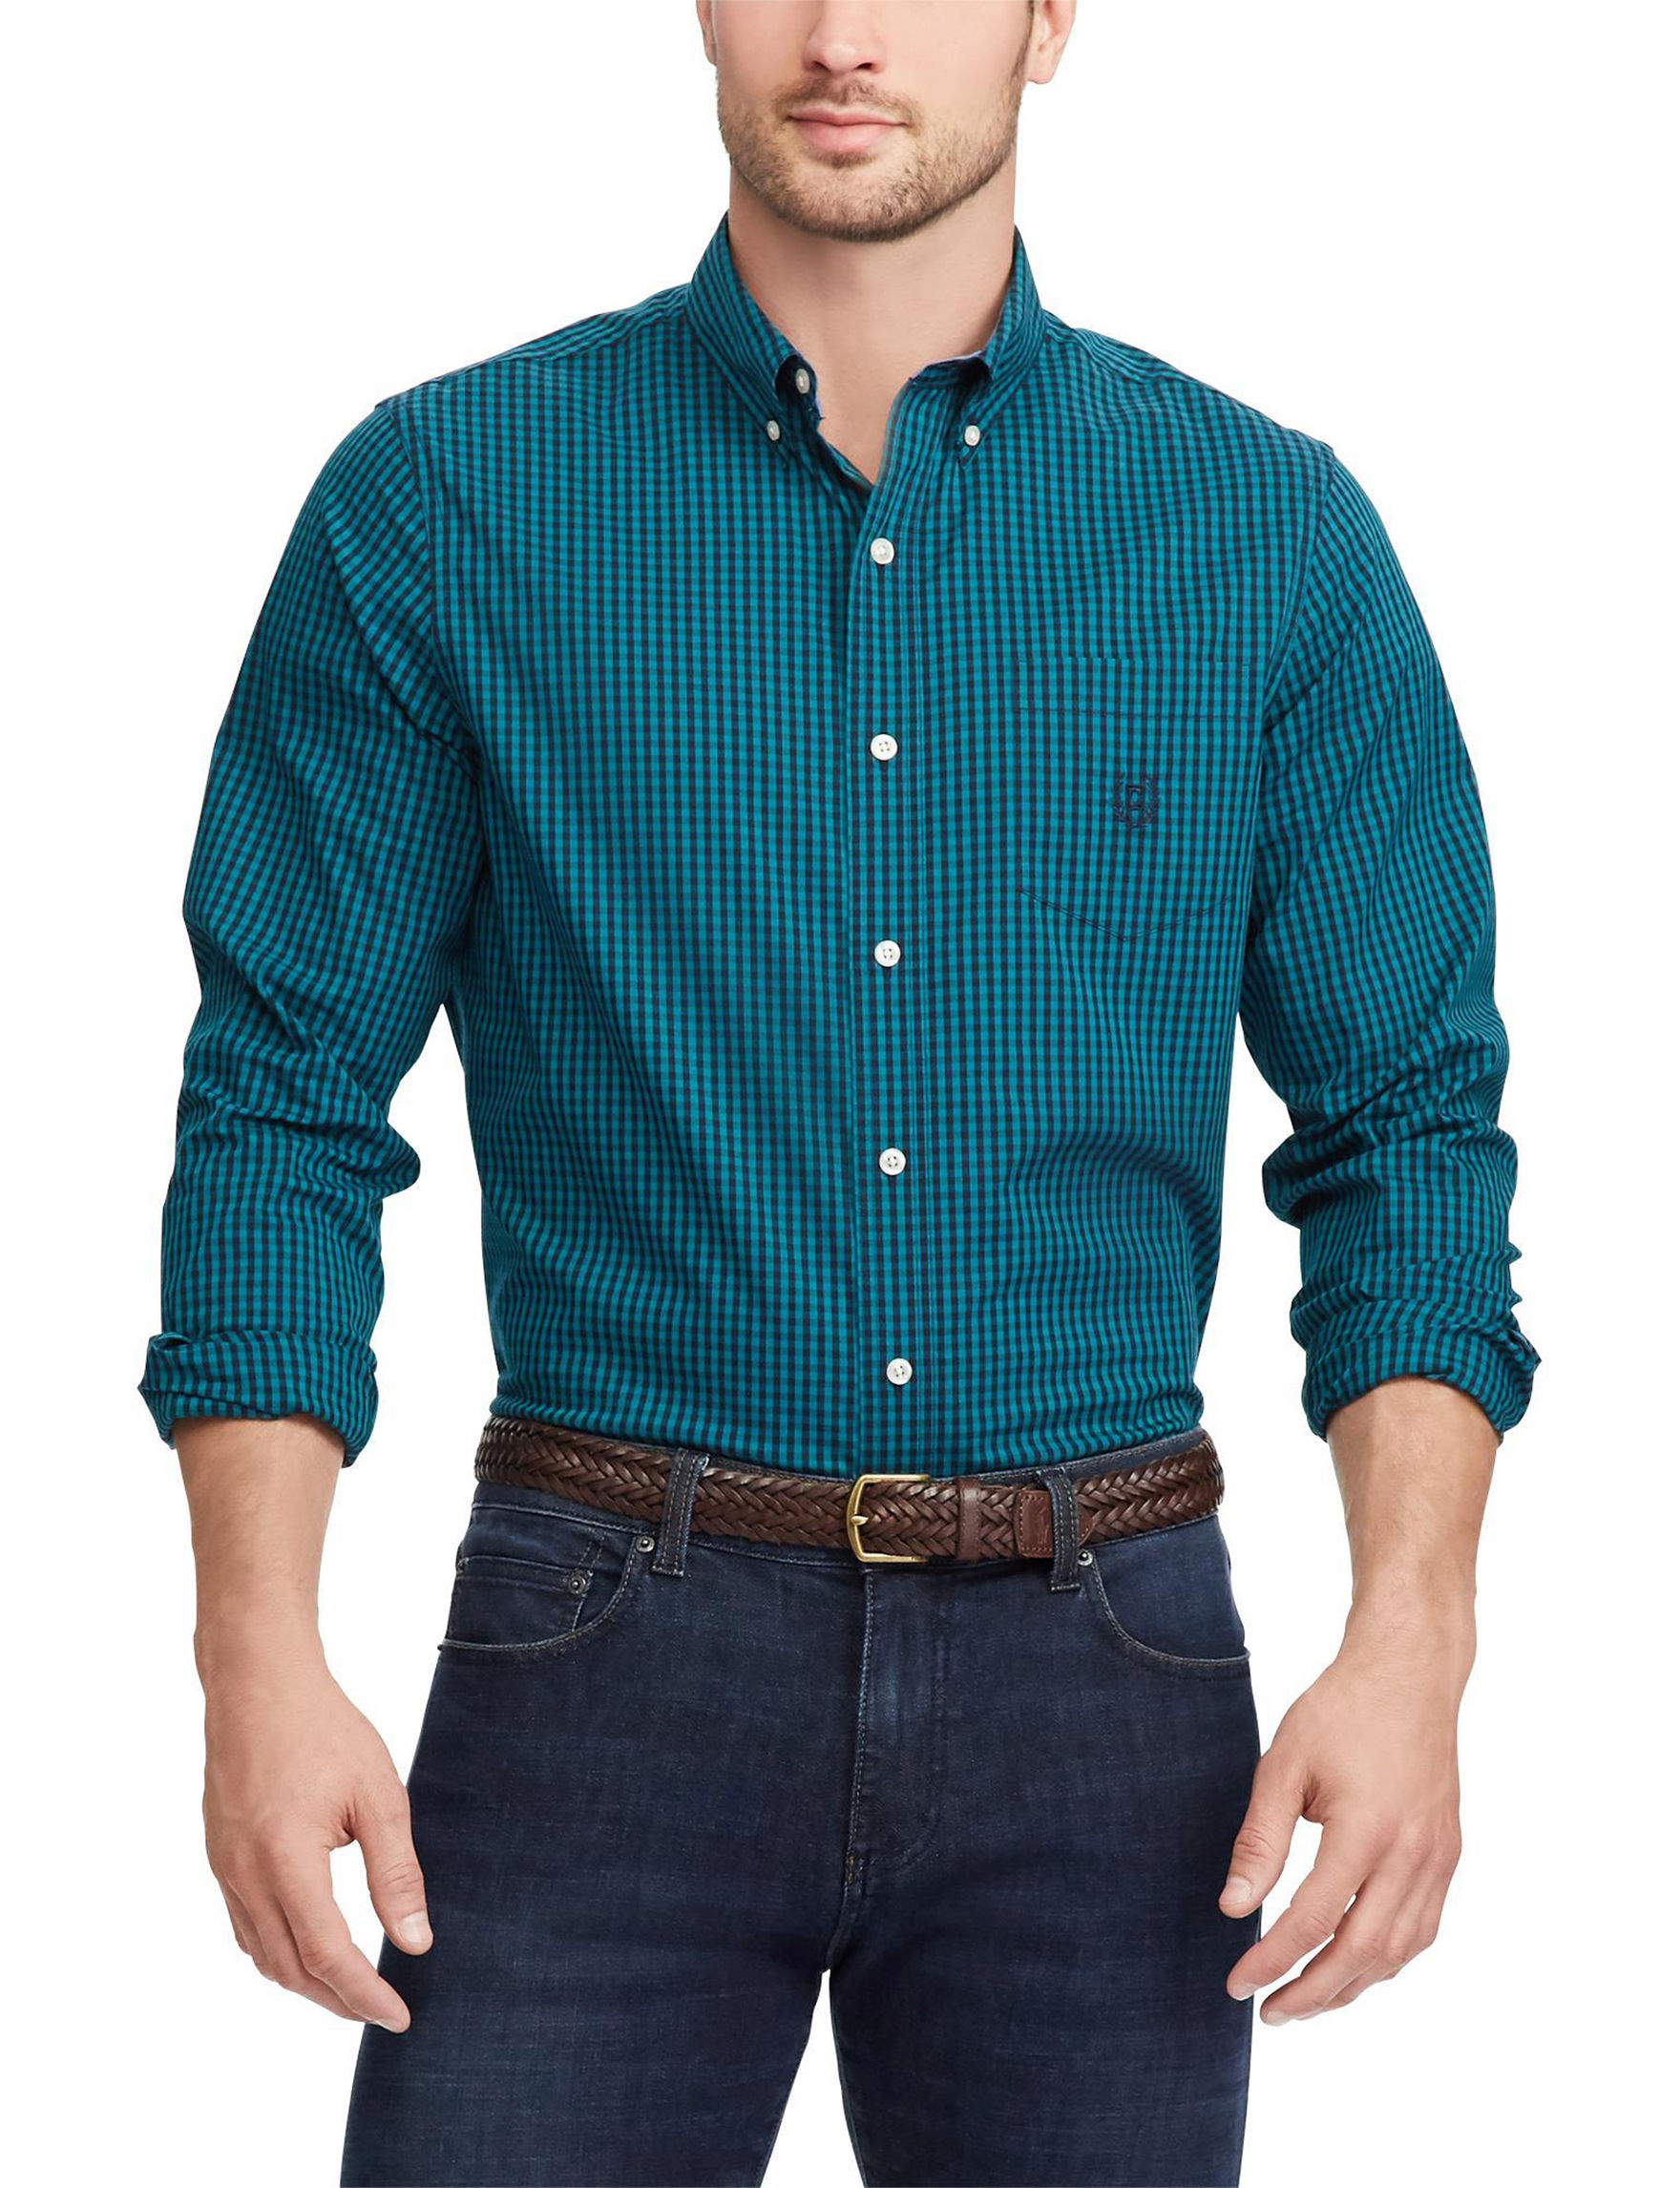 Chaps Green / Multi Casual Button Down Shirts